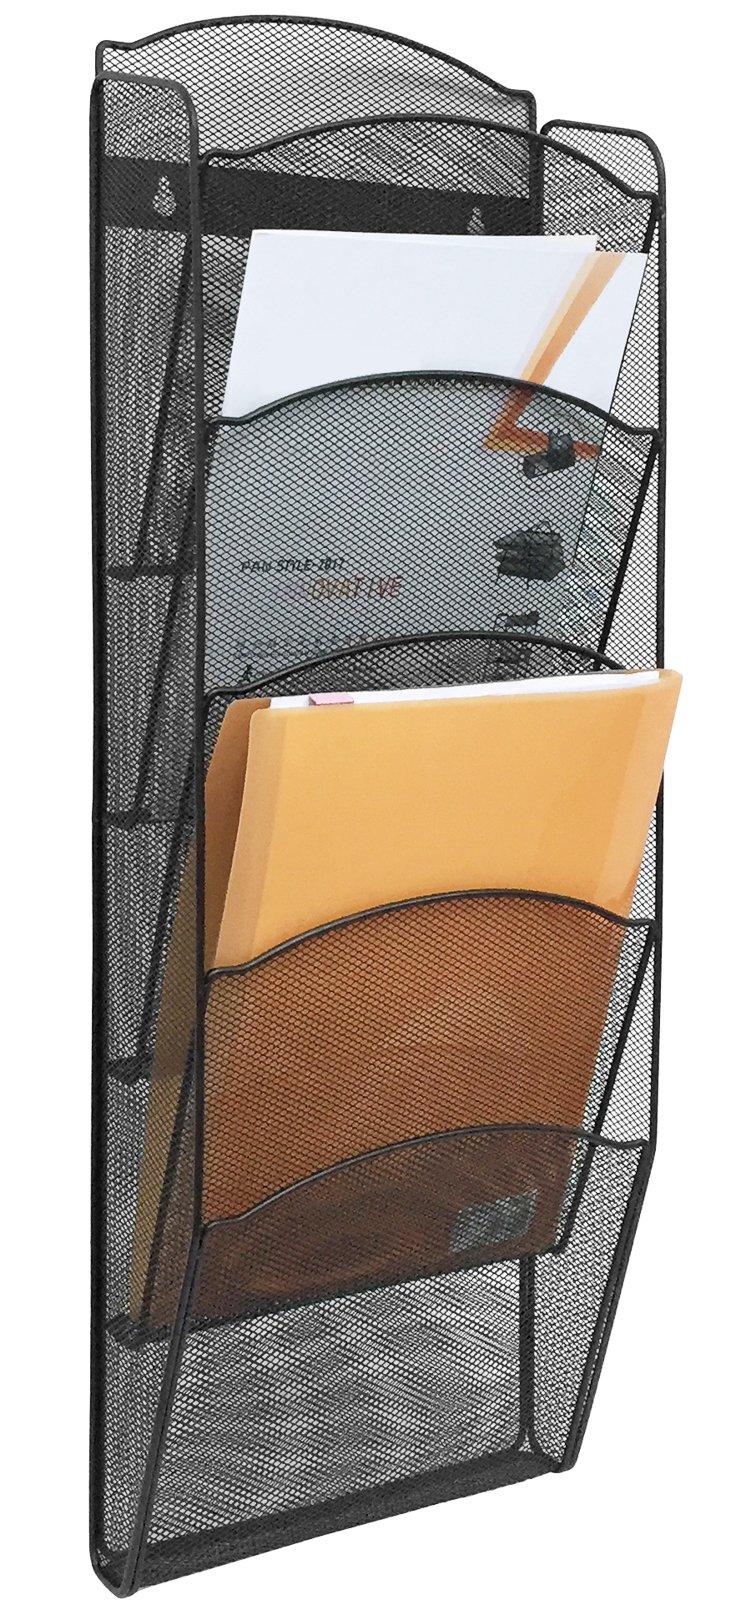 Greenco Mesh 5 Slot Wall Mounted Magazine Rack Holder, Black (GRC2579)